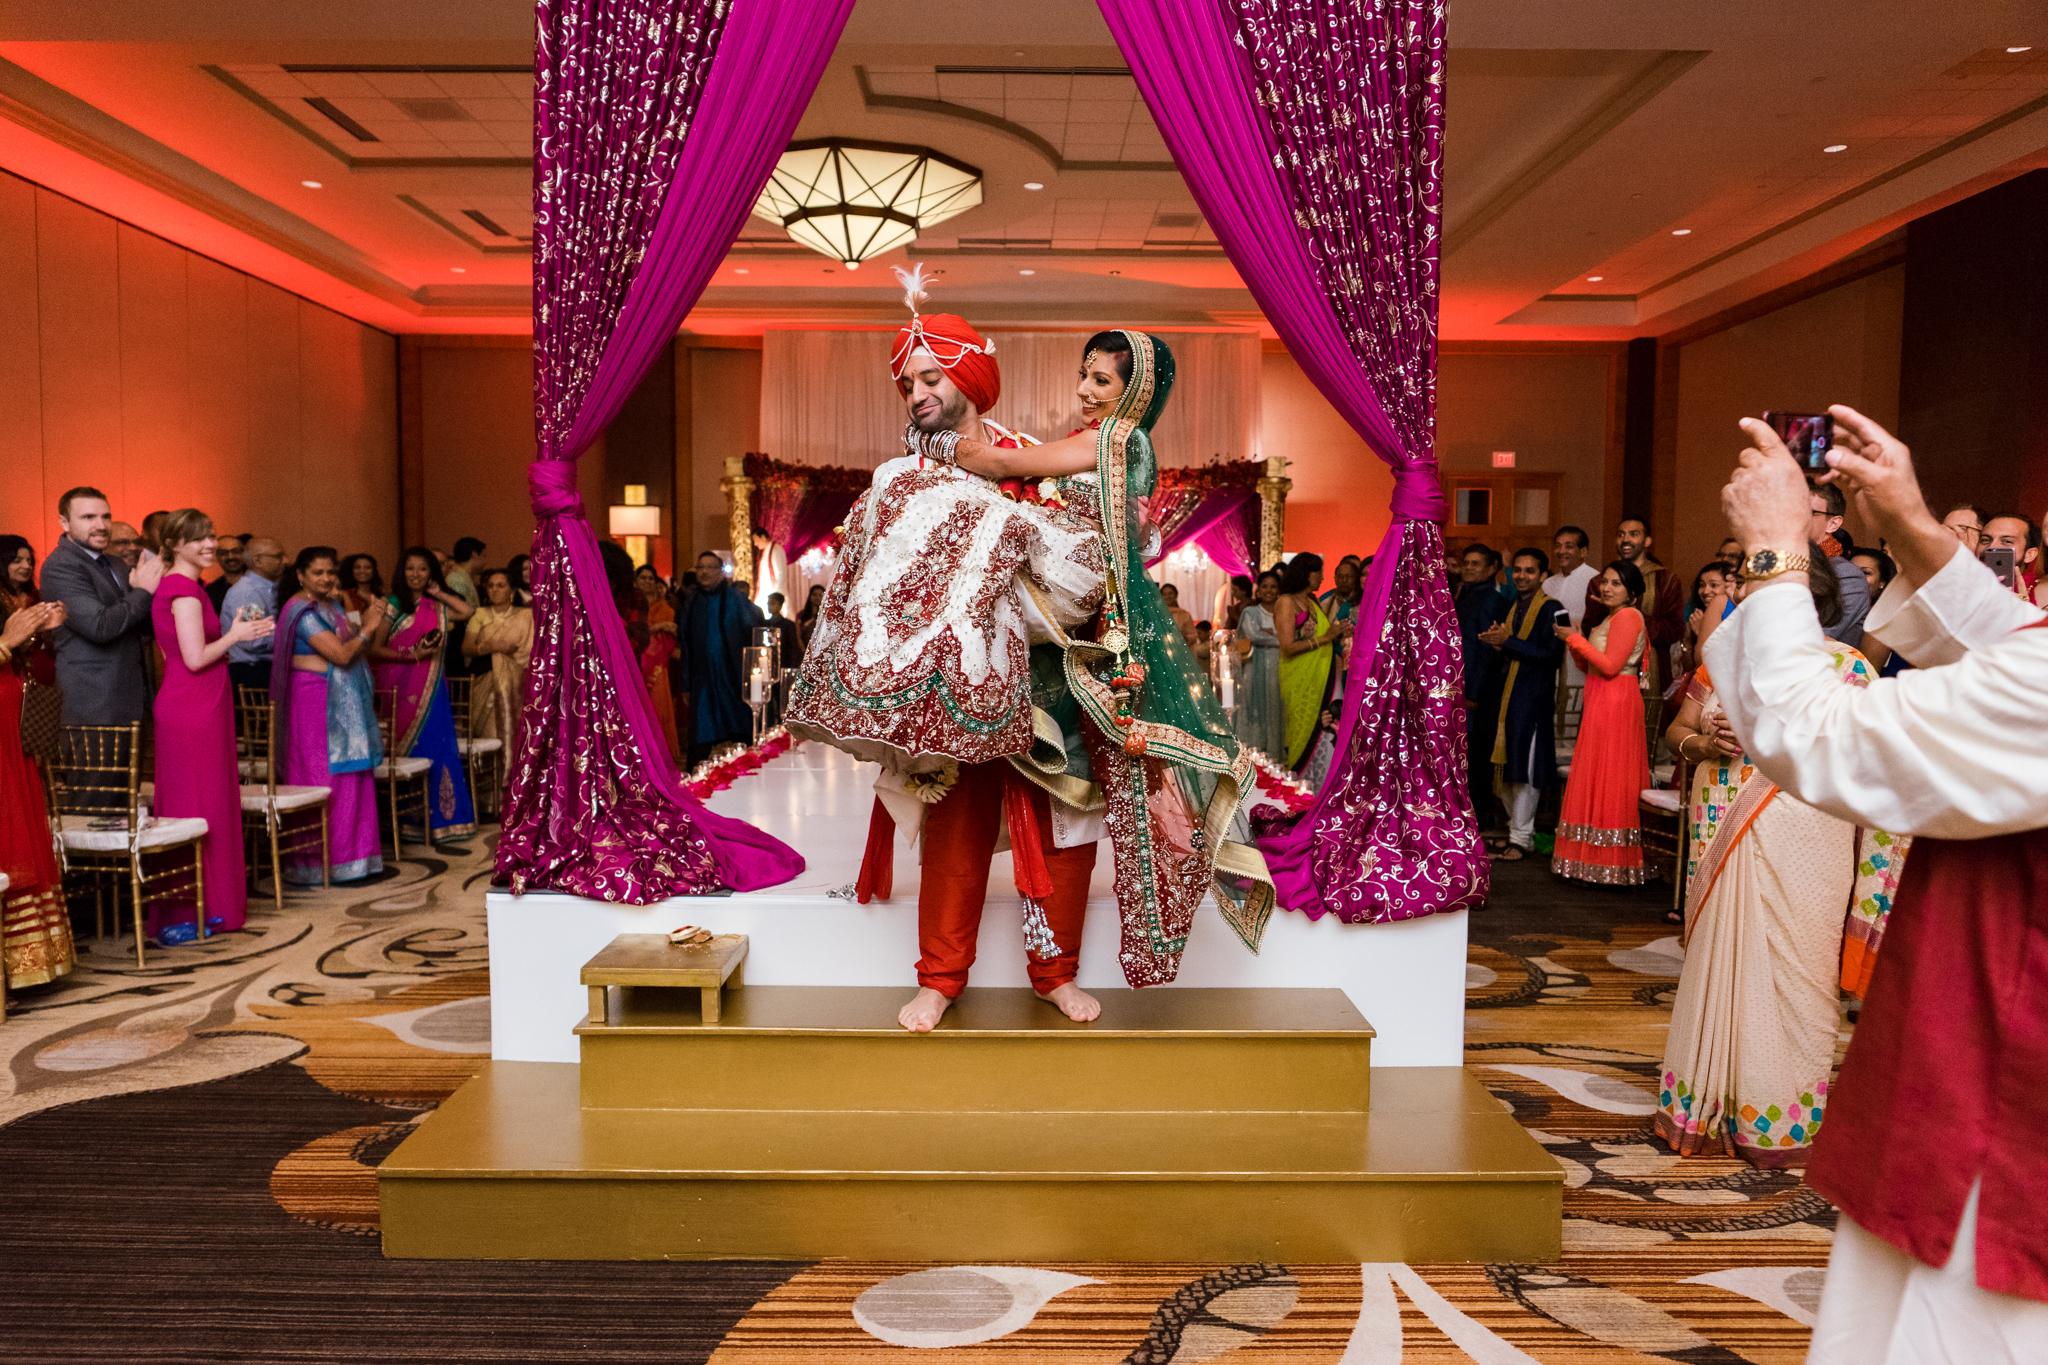 ReeyaAman-Wedding-Photography-www.MnMfoto.comMnMfoto-Krishna-Sajan-1253.jpg